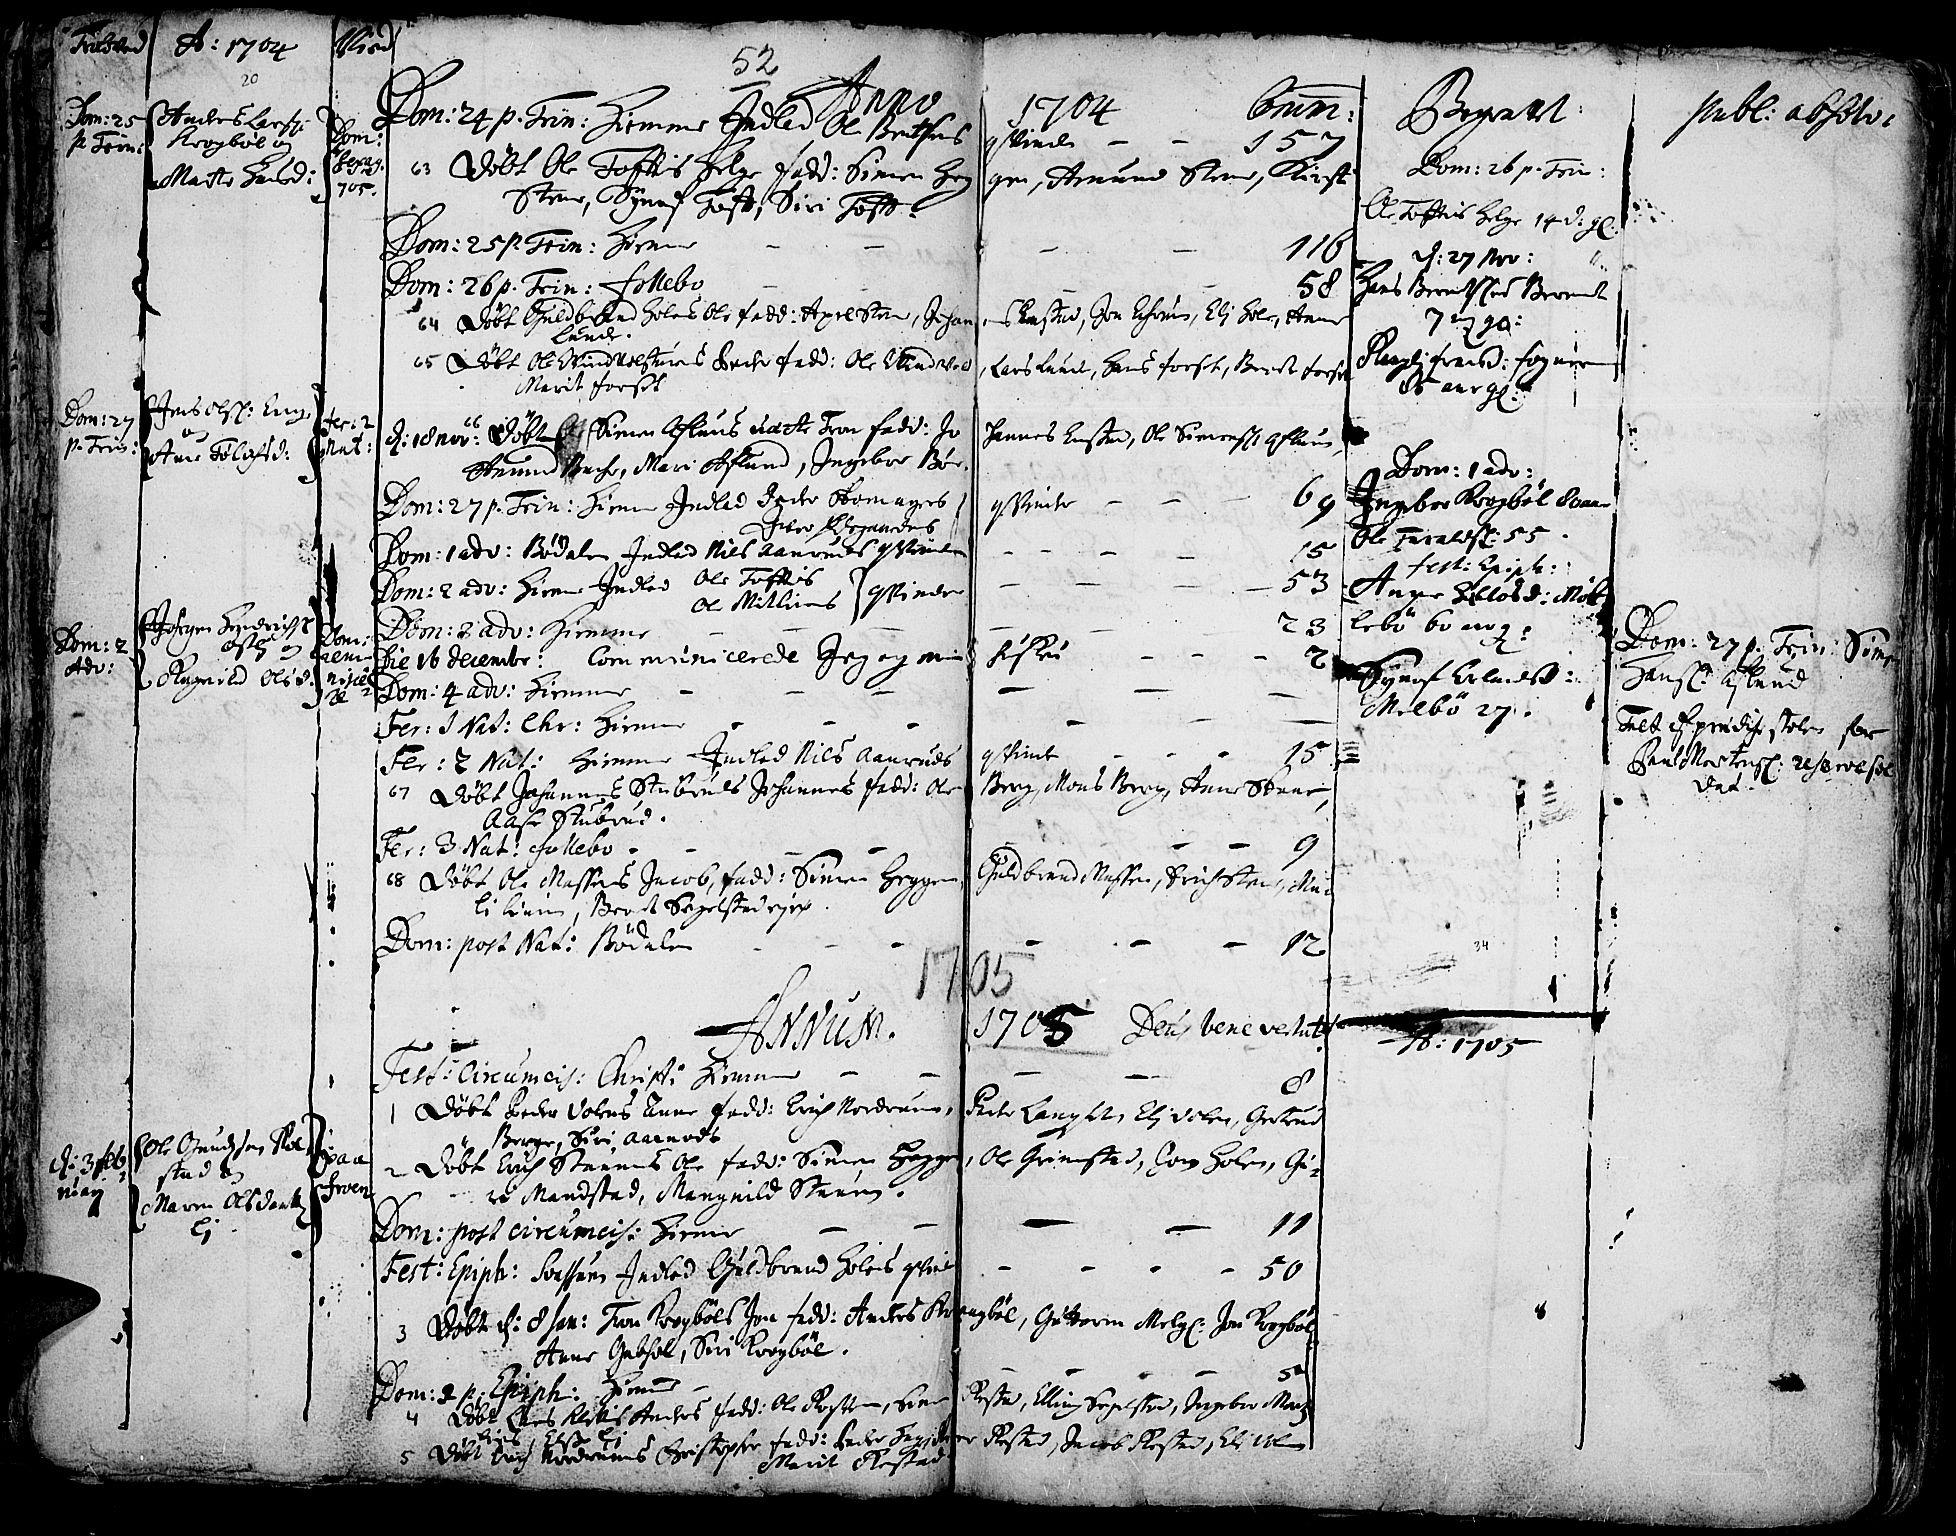 SAH, Gausdal prestekontor, Ministerialbok nr. 1, 1693-1728, s. 52